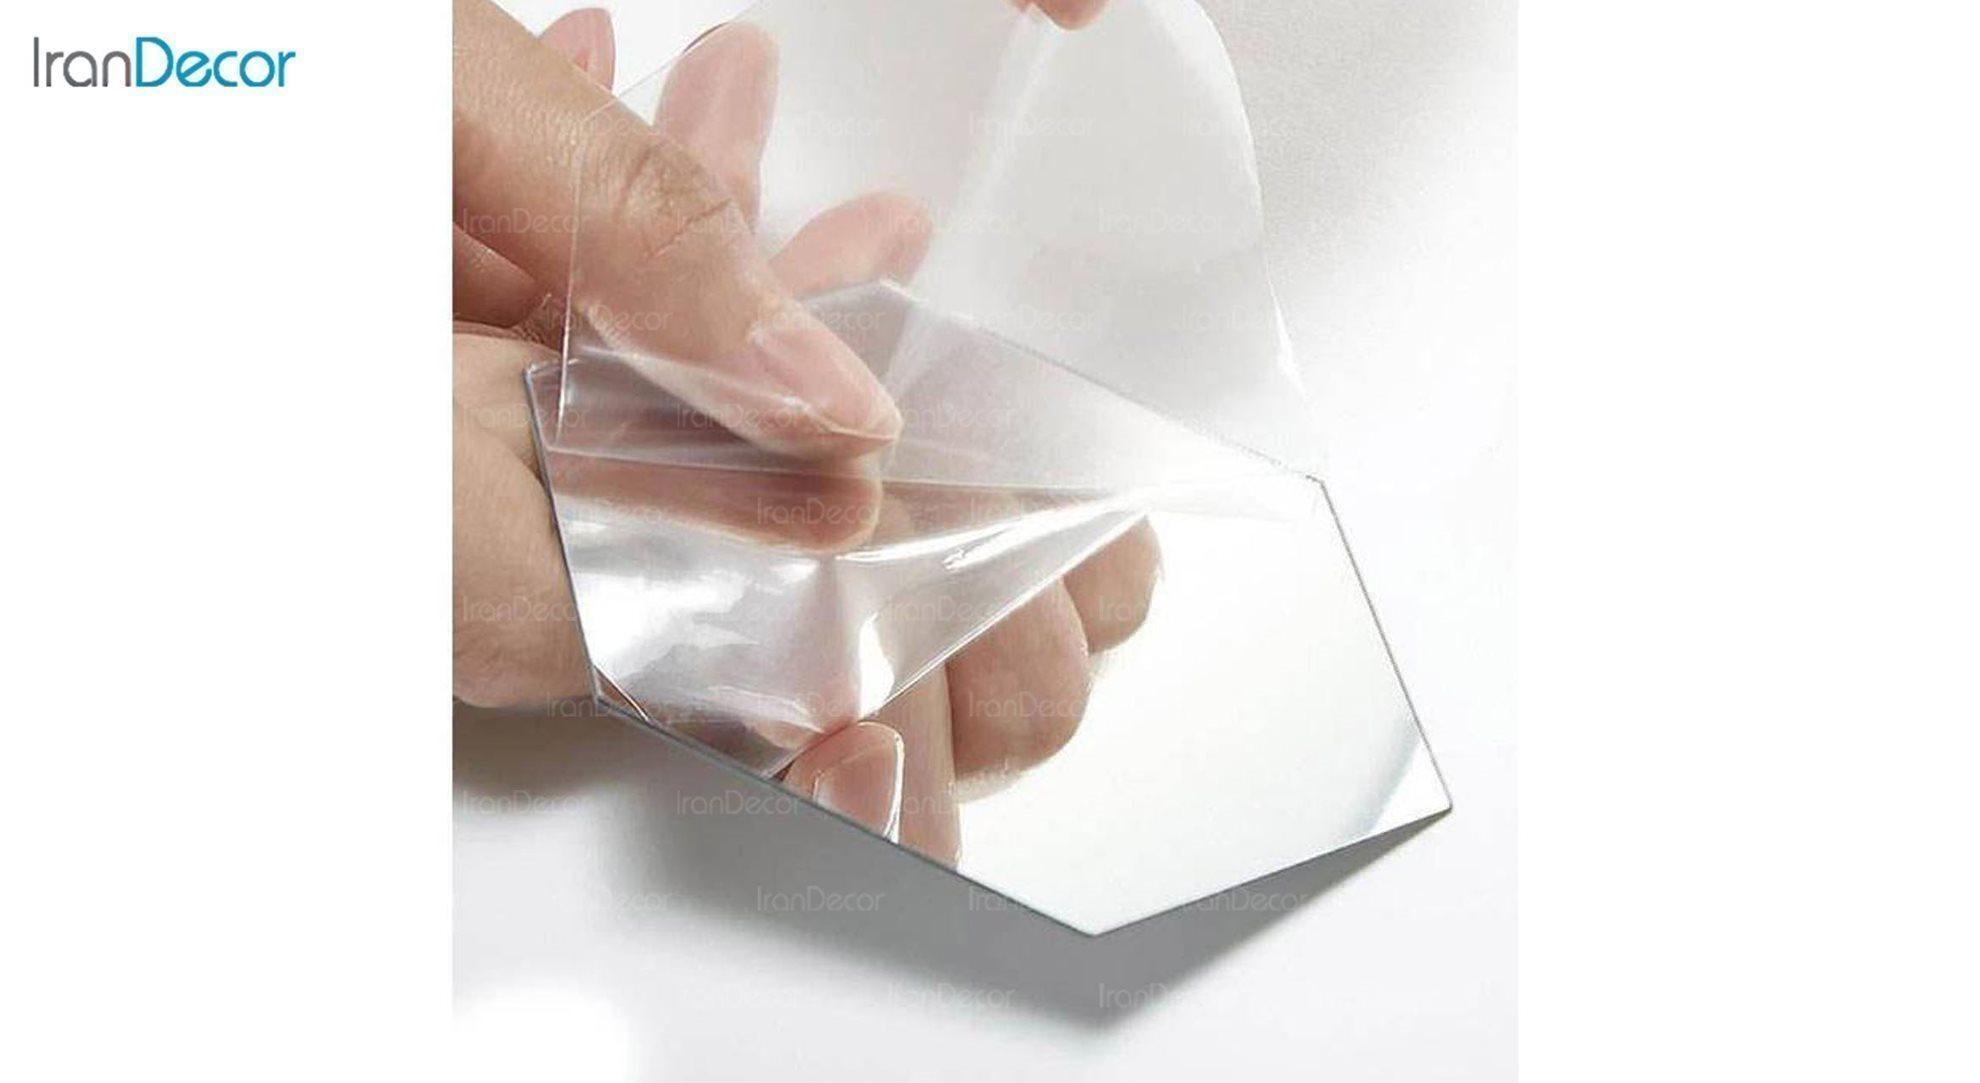 آینه پلکسی گلس طرح اژدها رومادون کد 449 قطر 90 سانتی مترنایلون ضد خش